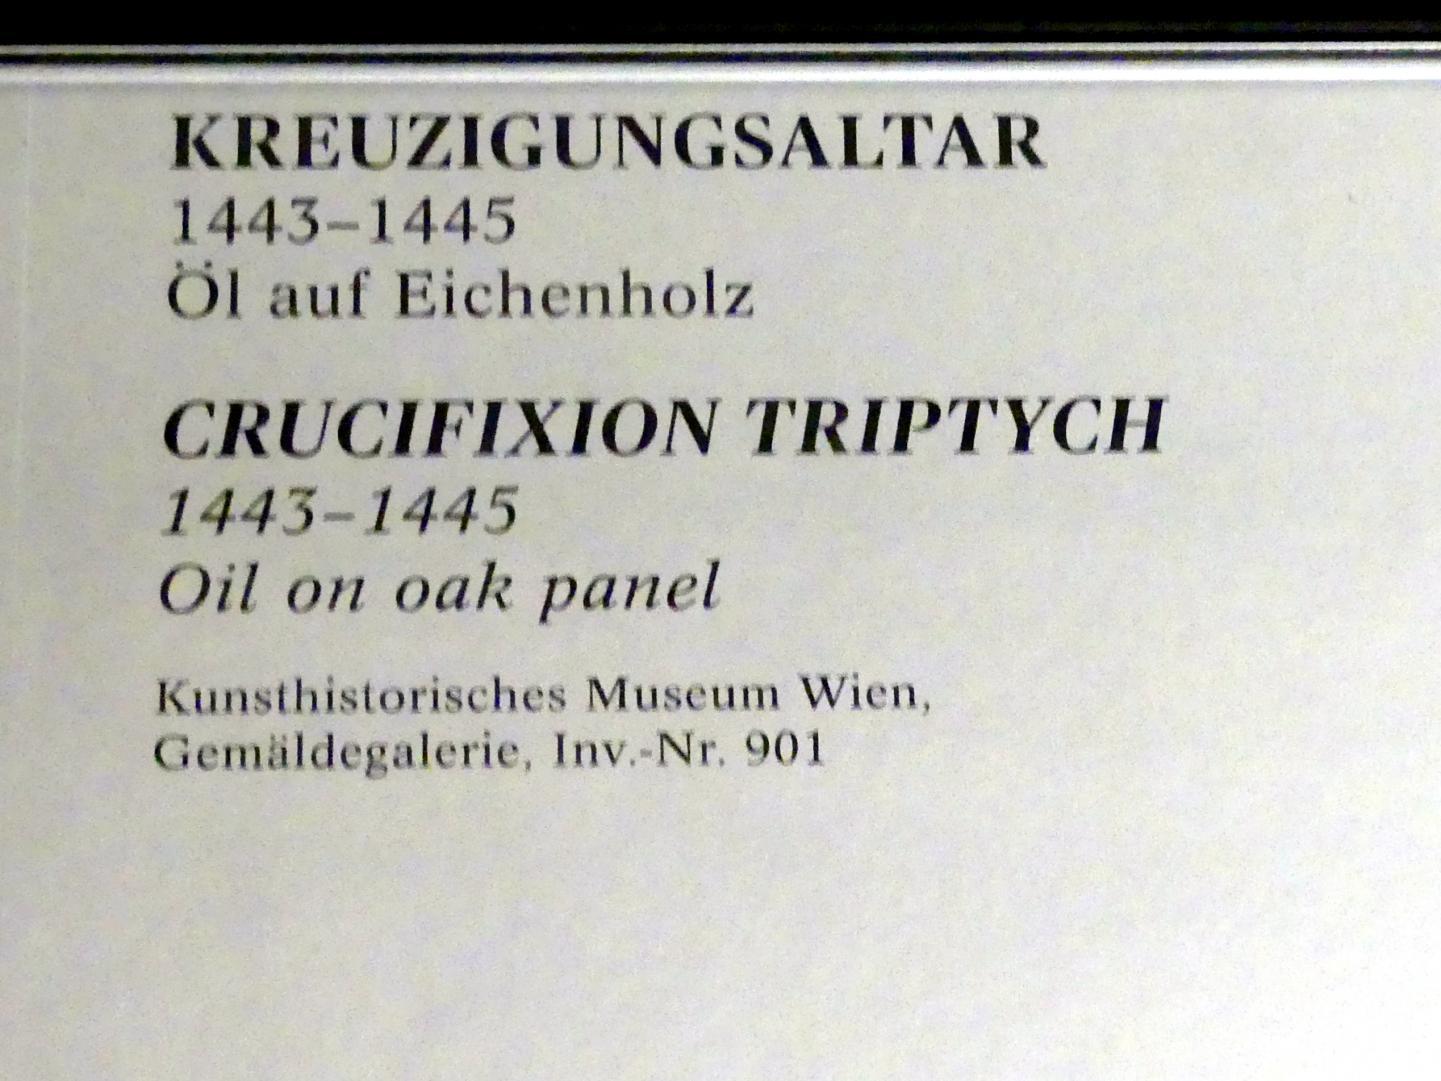 Rogier van der Weyden: Kreuzigungsaltar, 1443 - 1445, Bild 6/6